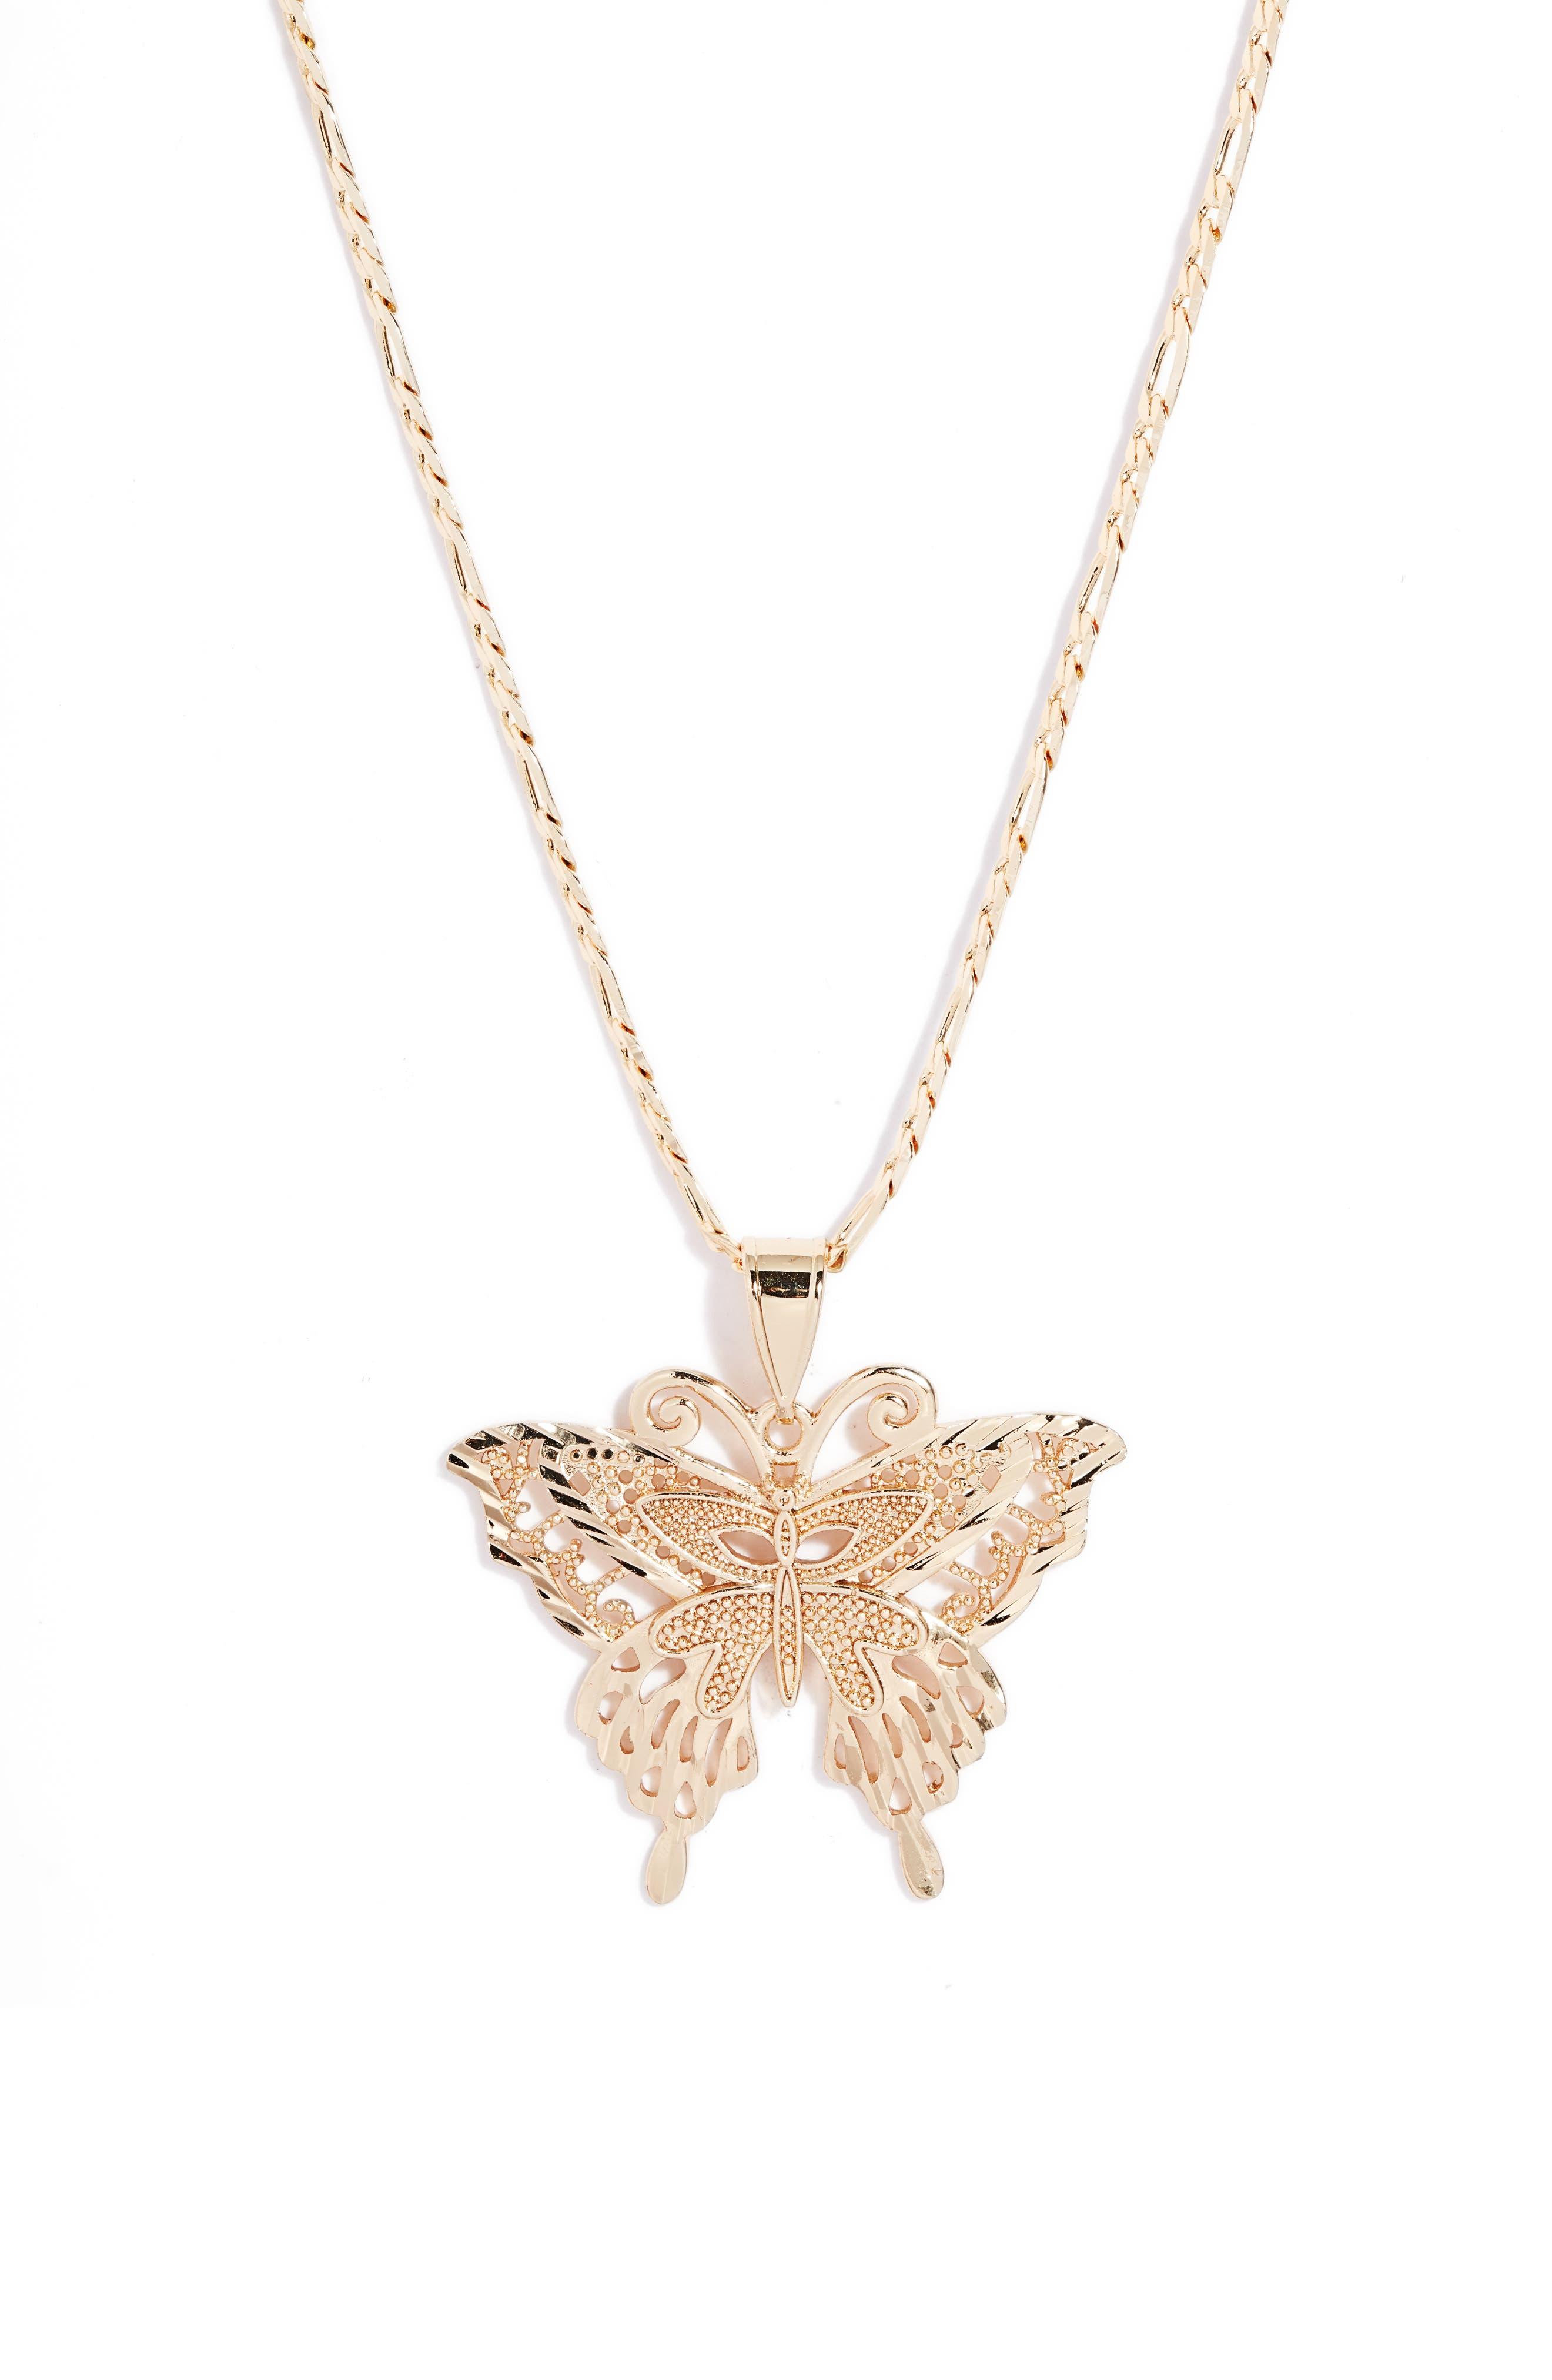 Ornate Butterfly Pendant Necklace